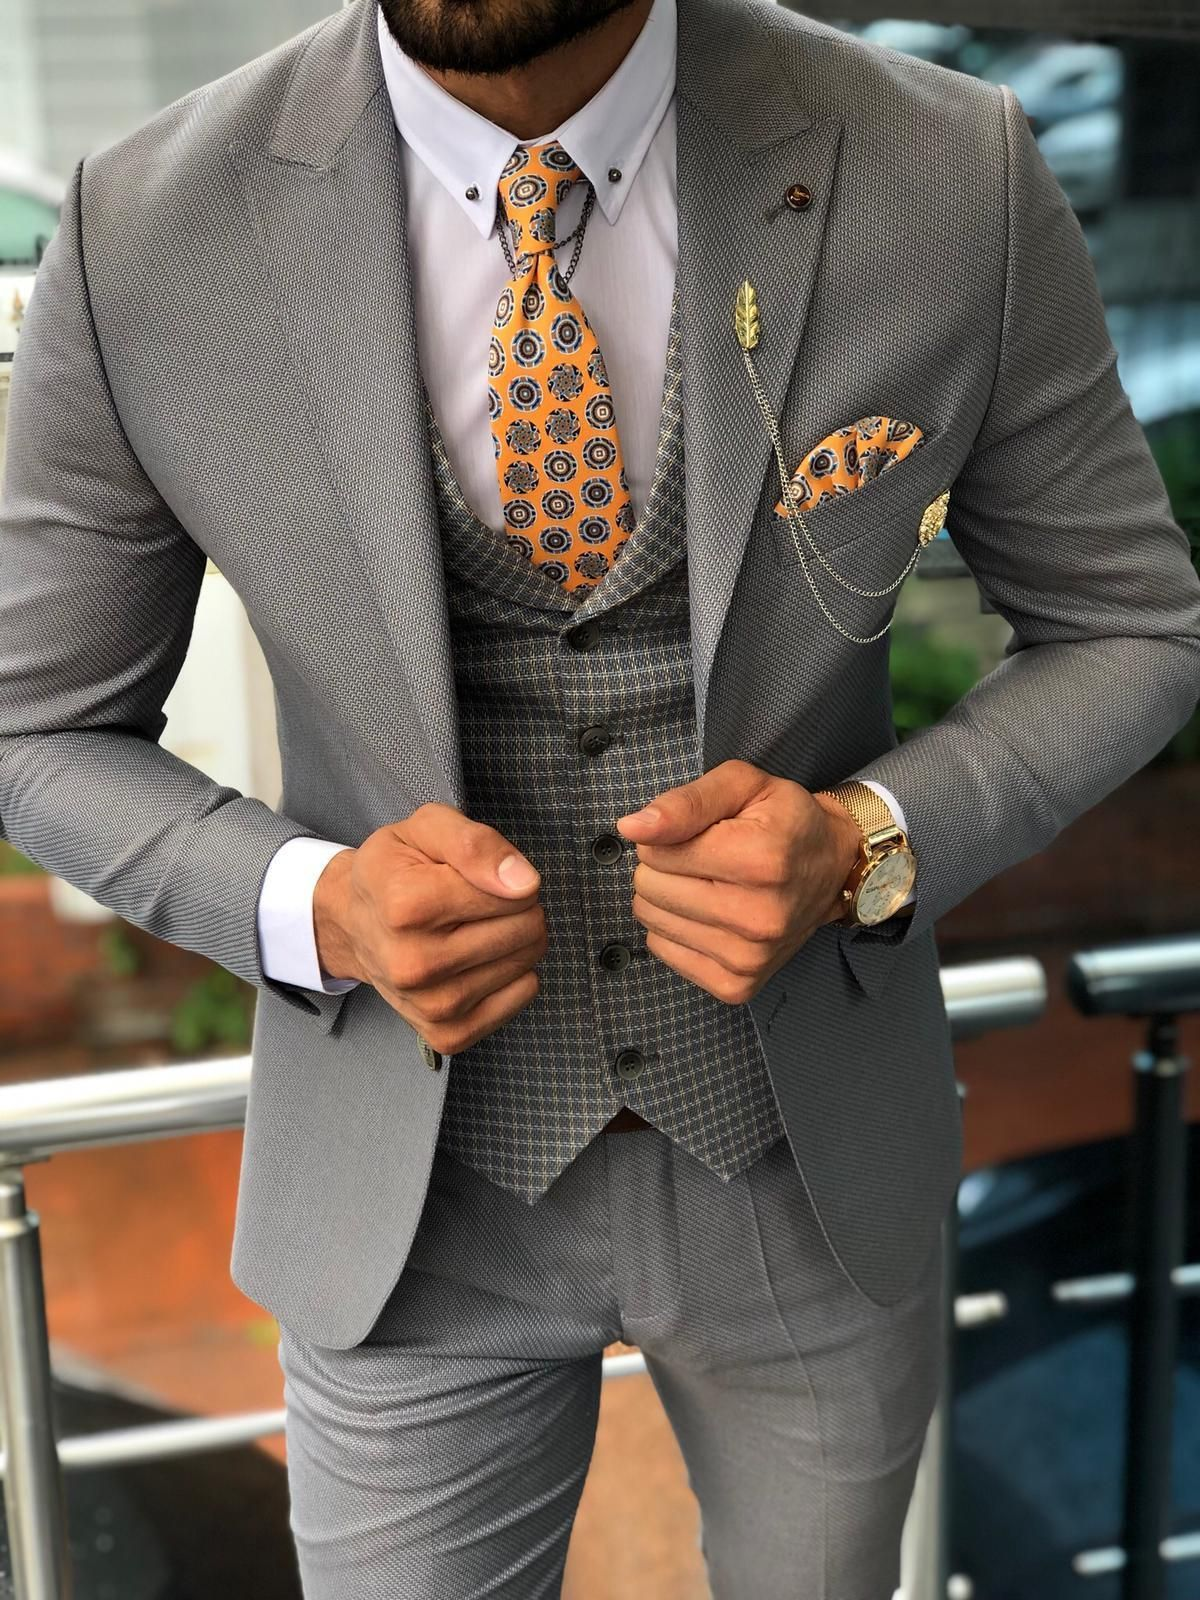 Clarendon Slim Fit Grauer Anzug MCR TAILOR #Anzug